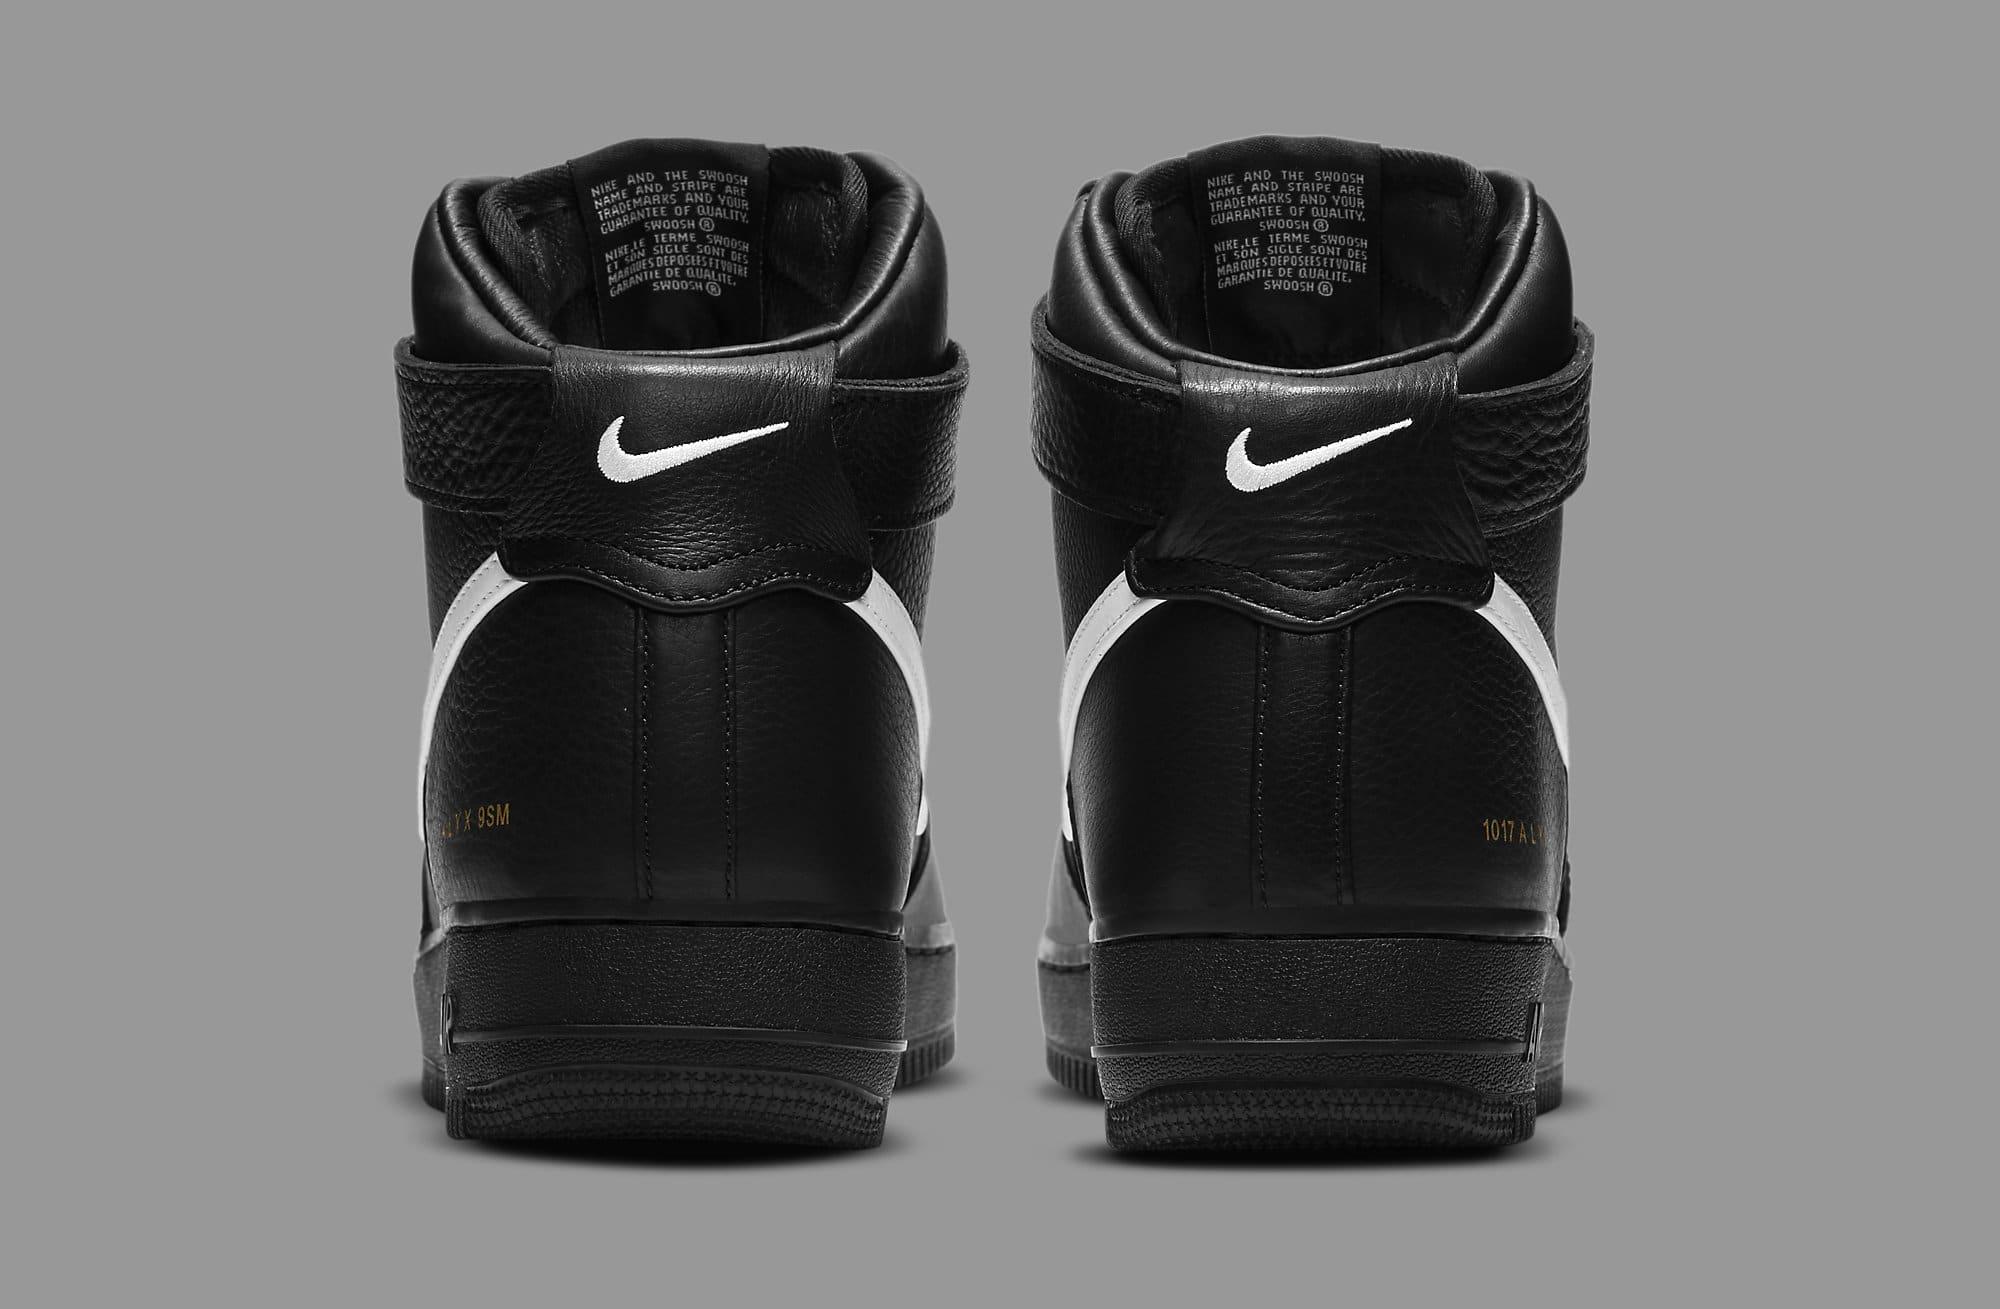 Alyx x Nike Air Force 1 High CQ4018-002 Heel